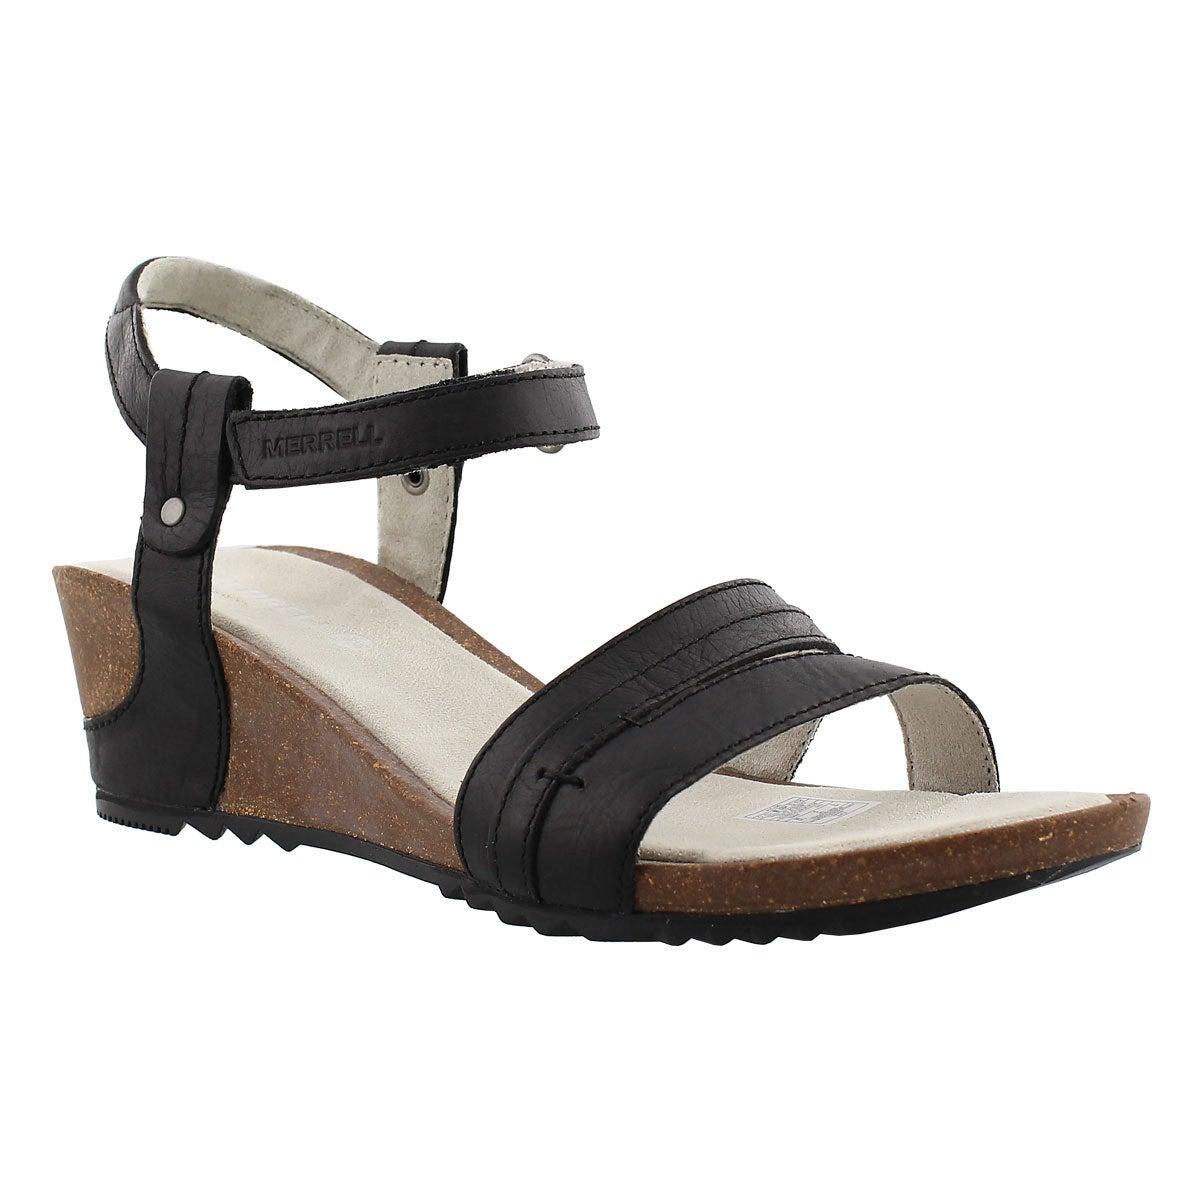 Lds Revalli Aura Strap blk wedge sandal